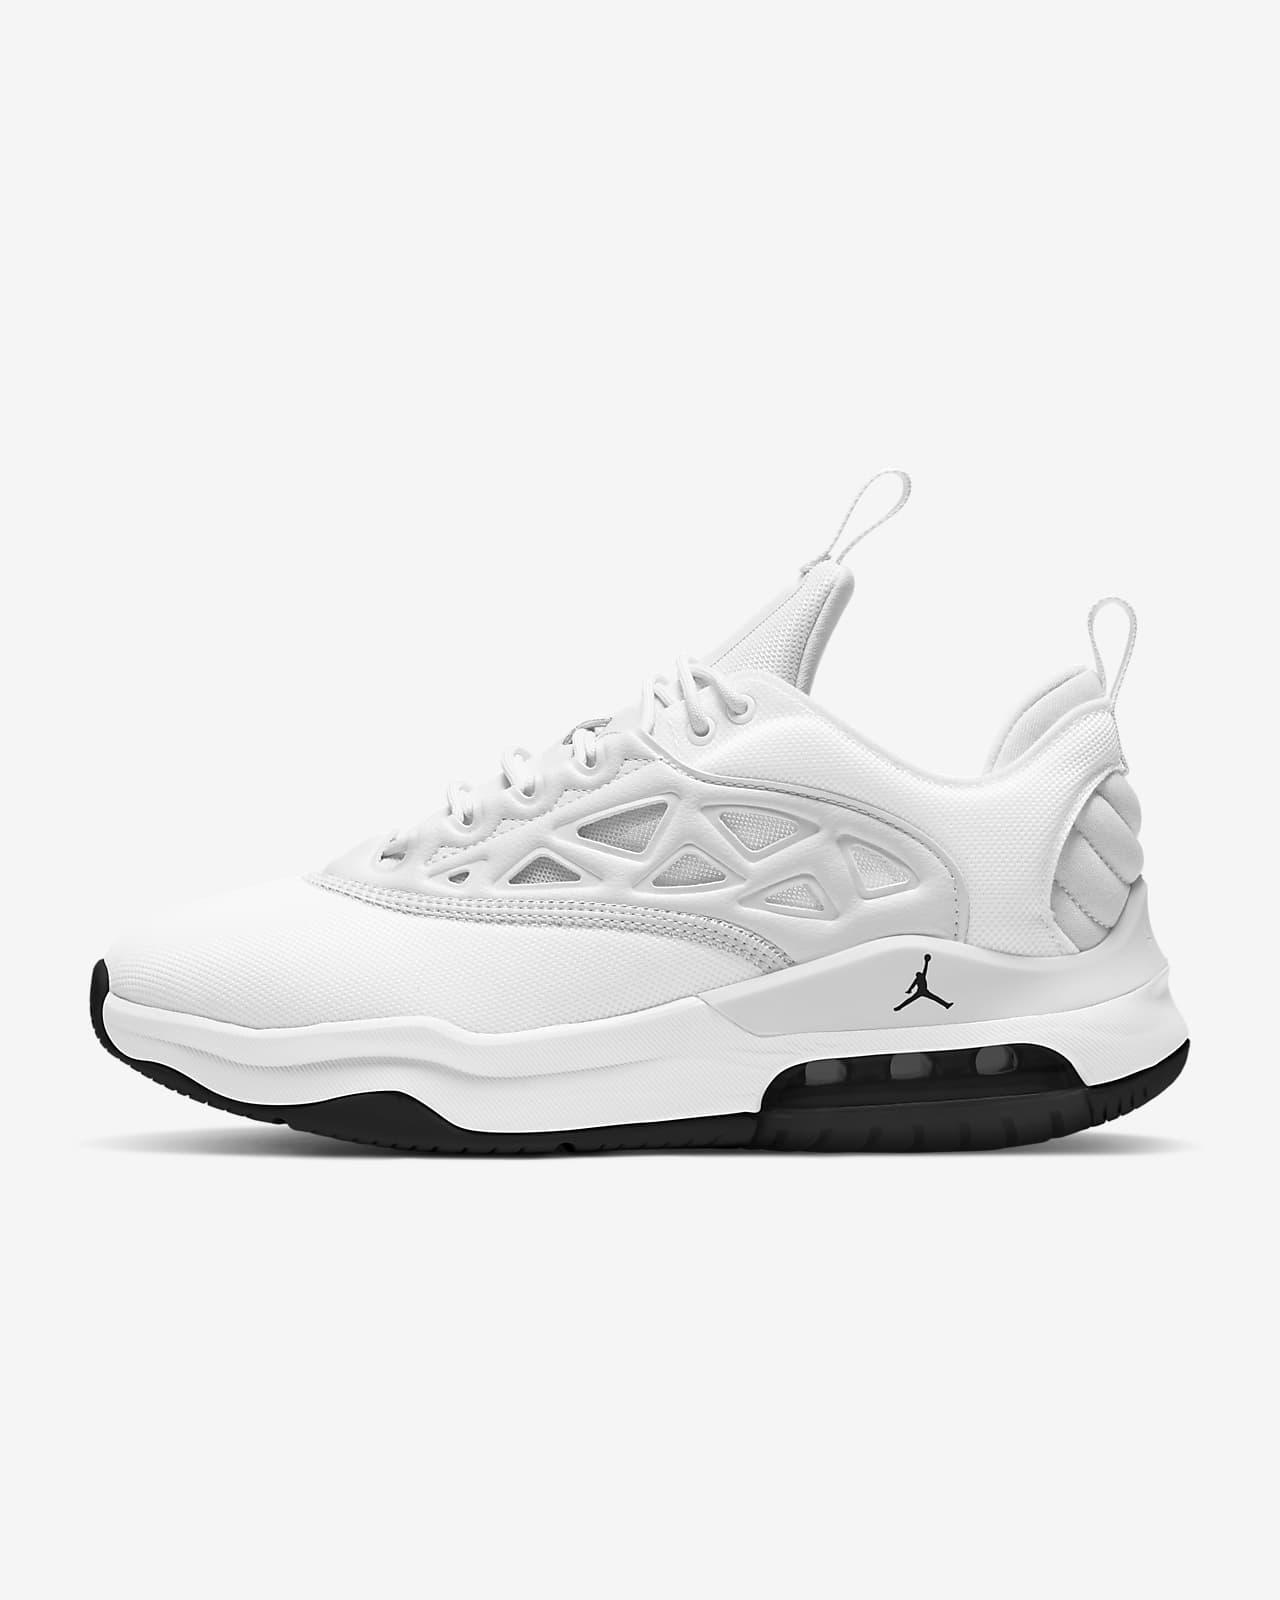 Actor suspensión Dispersión  Jordan Air Max 200 XX Women's Shoe. Nike VN